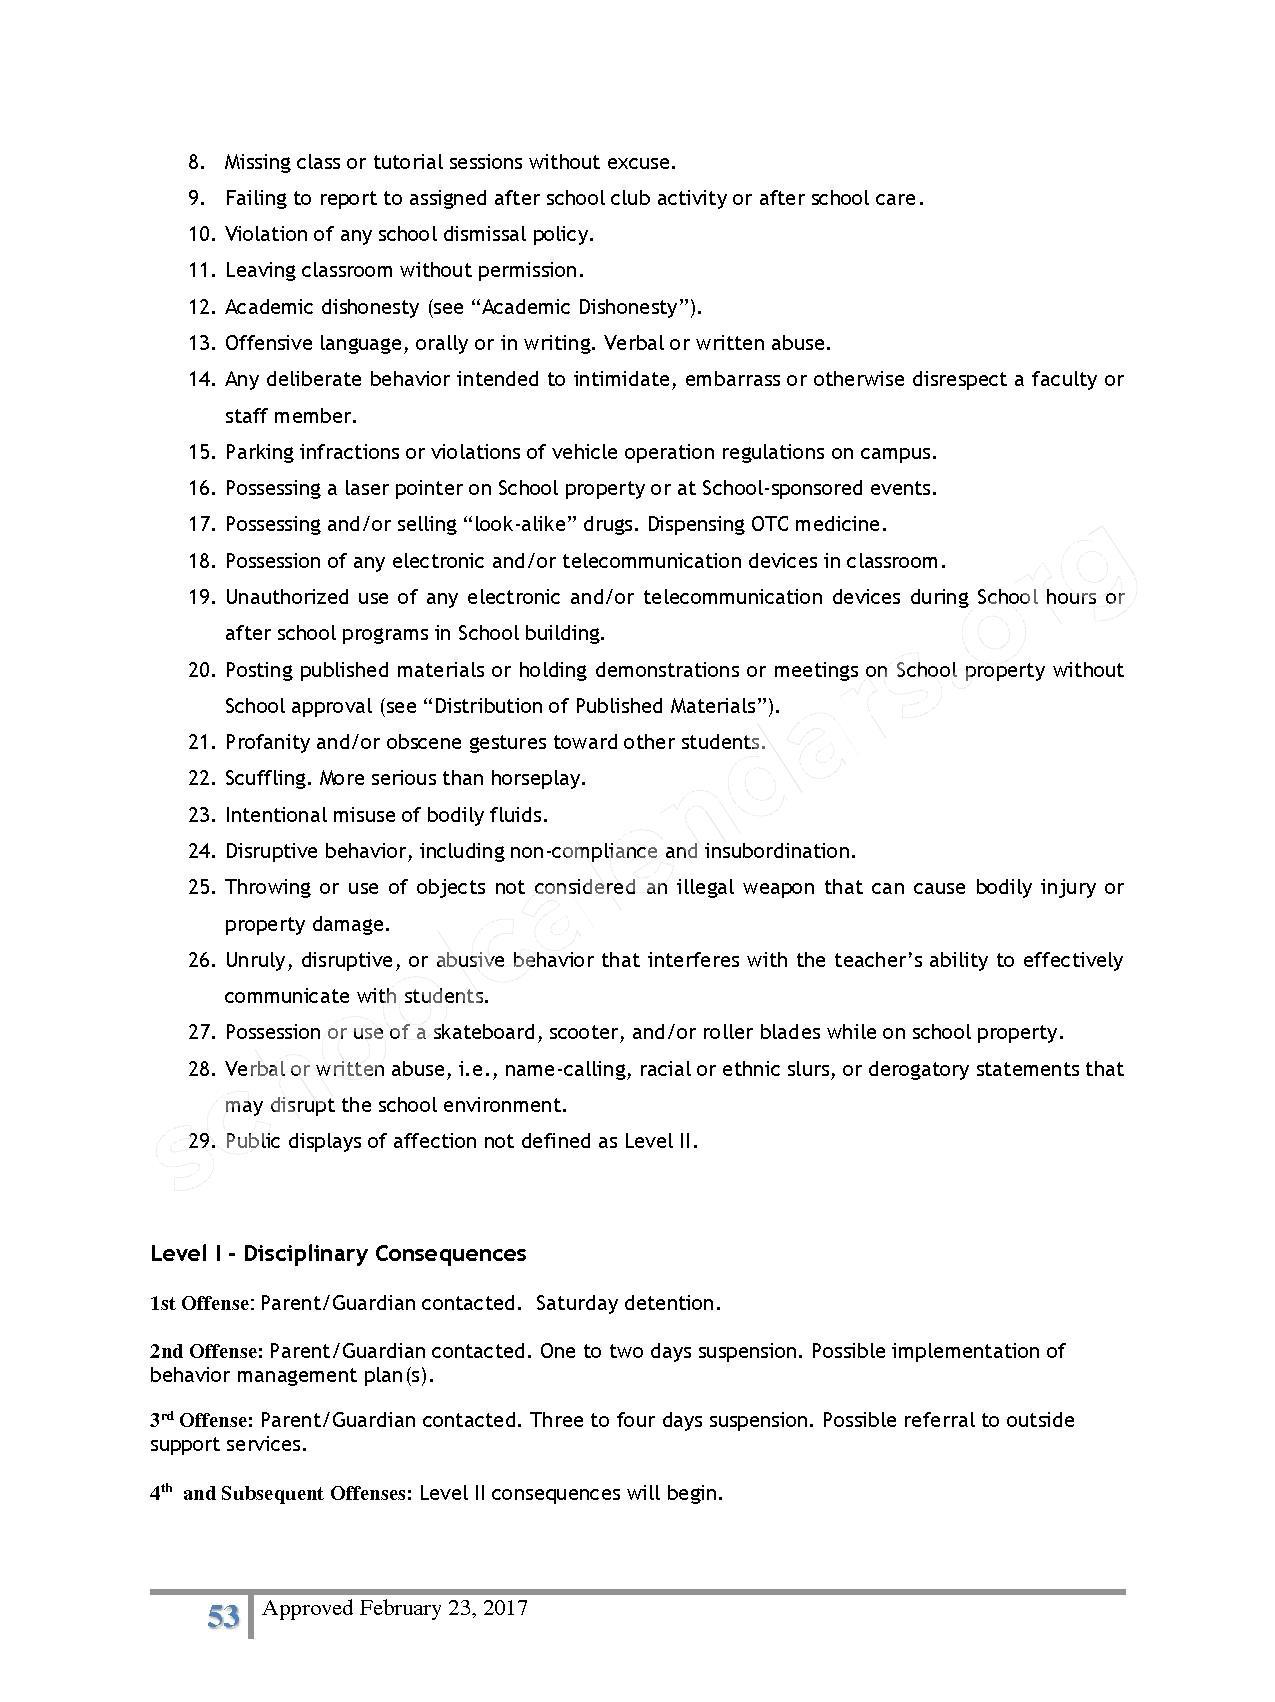 2016 - 2017 District Calendar – Lisa Academy Public Charter Schools – page 53